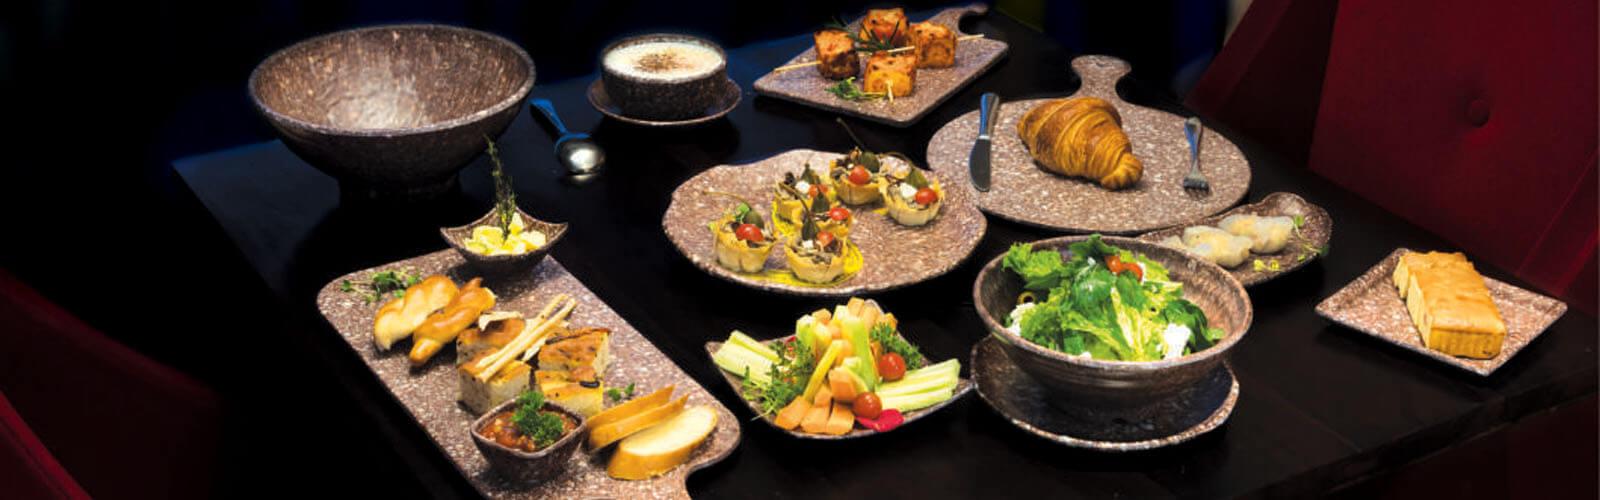 Dinewell | Buy 100% Melamineware Plates, Bowls, Crockery Items